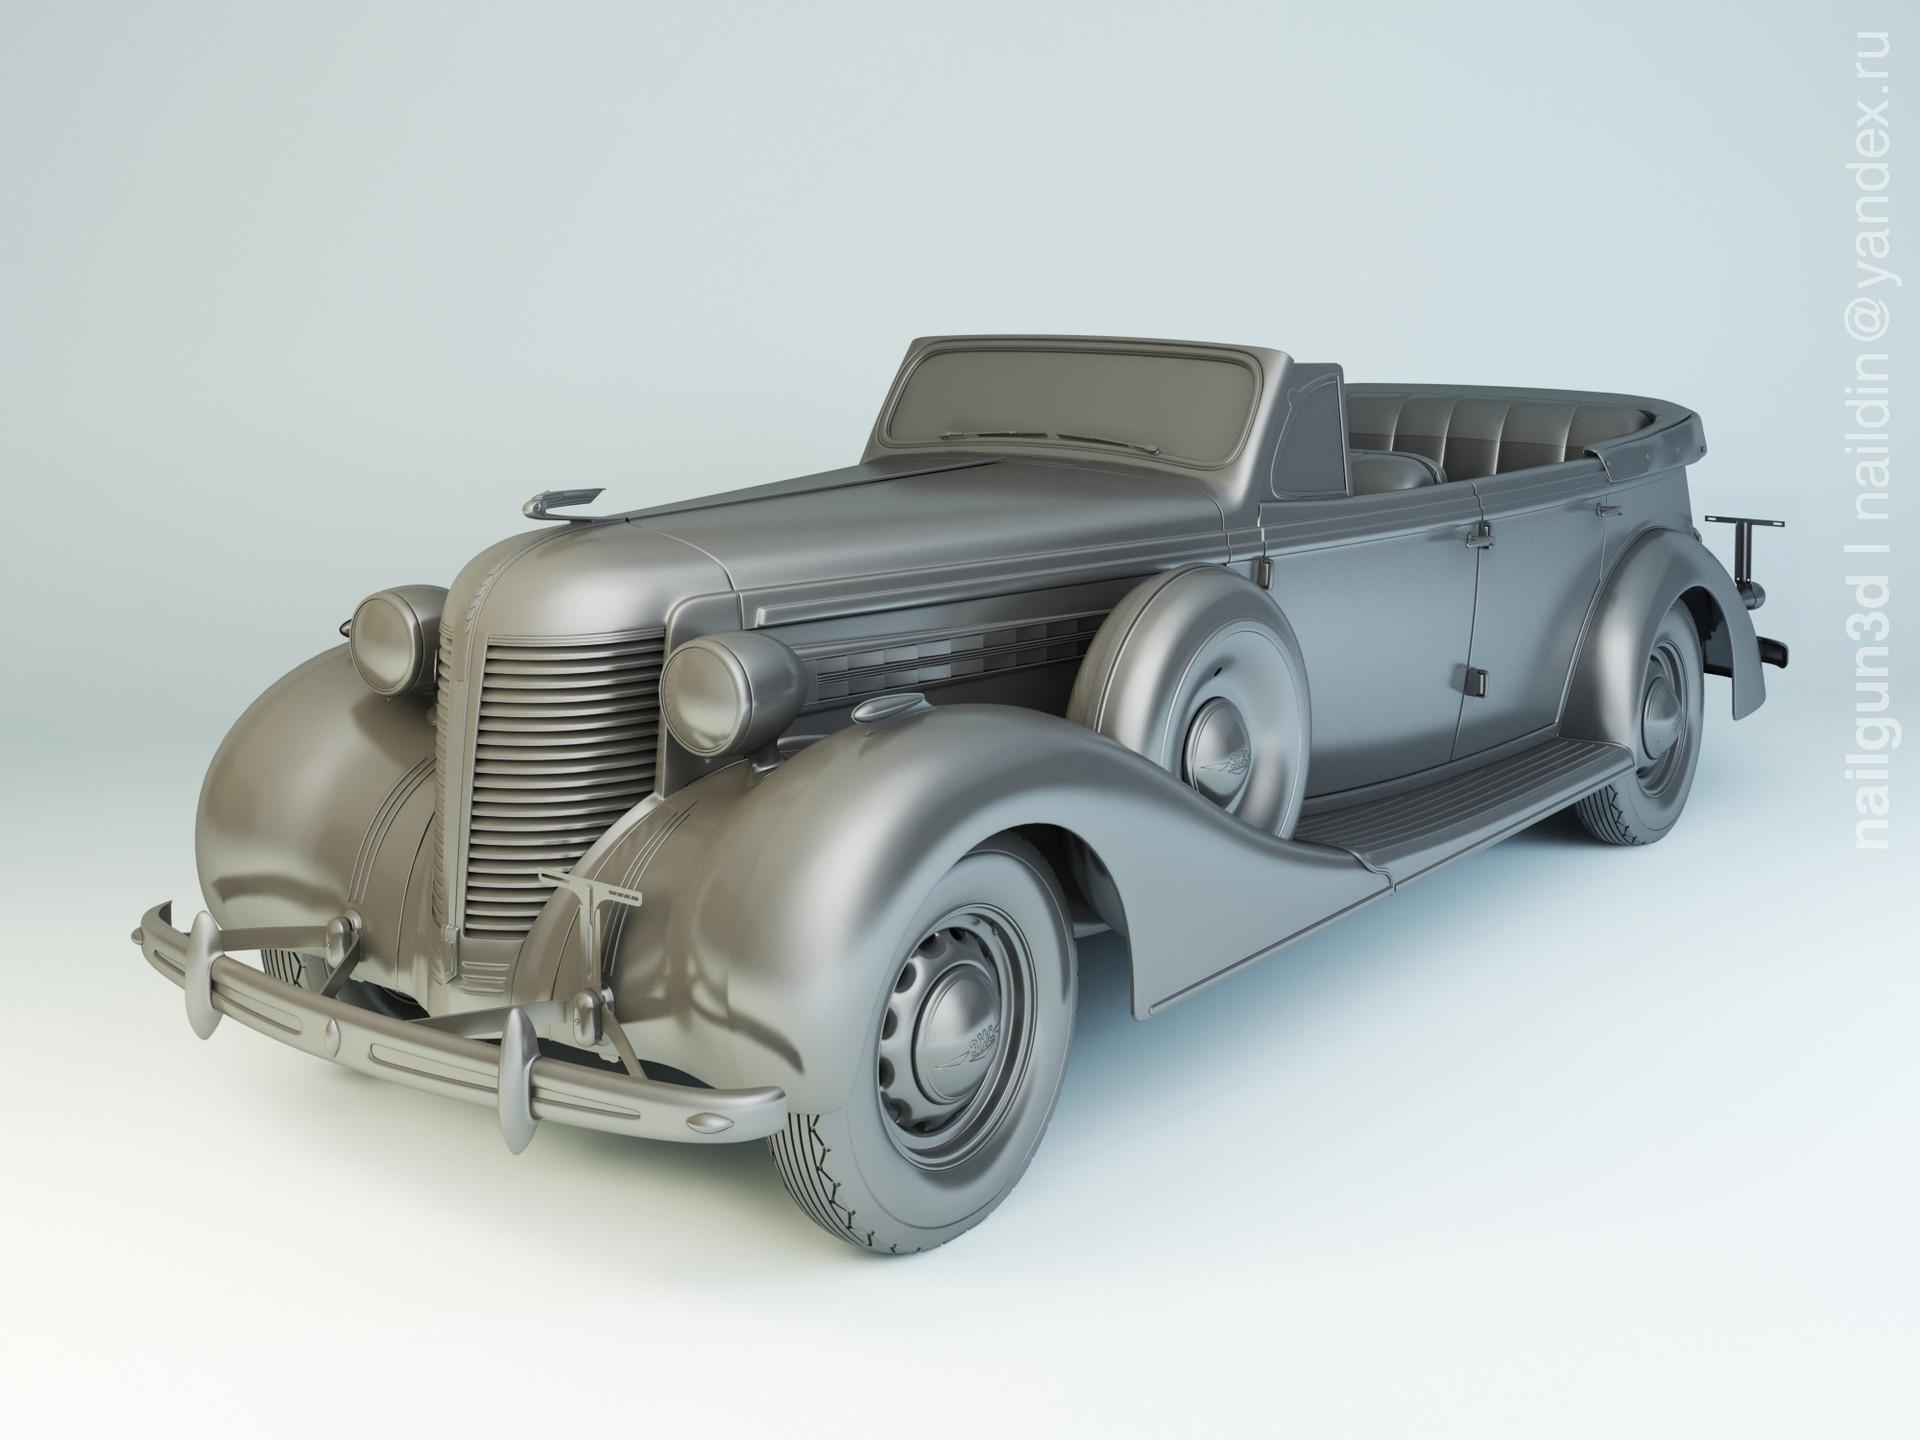 Nail khusnutdinov als 210 014 zis 102a 1939 modelling 0